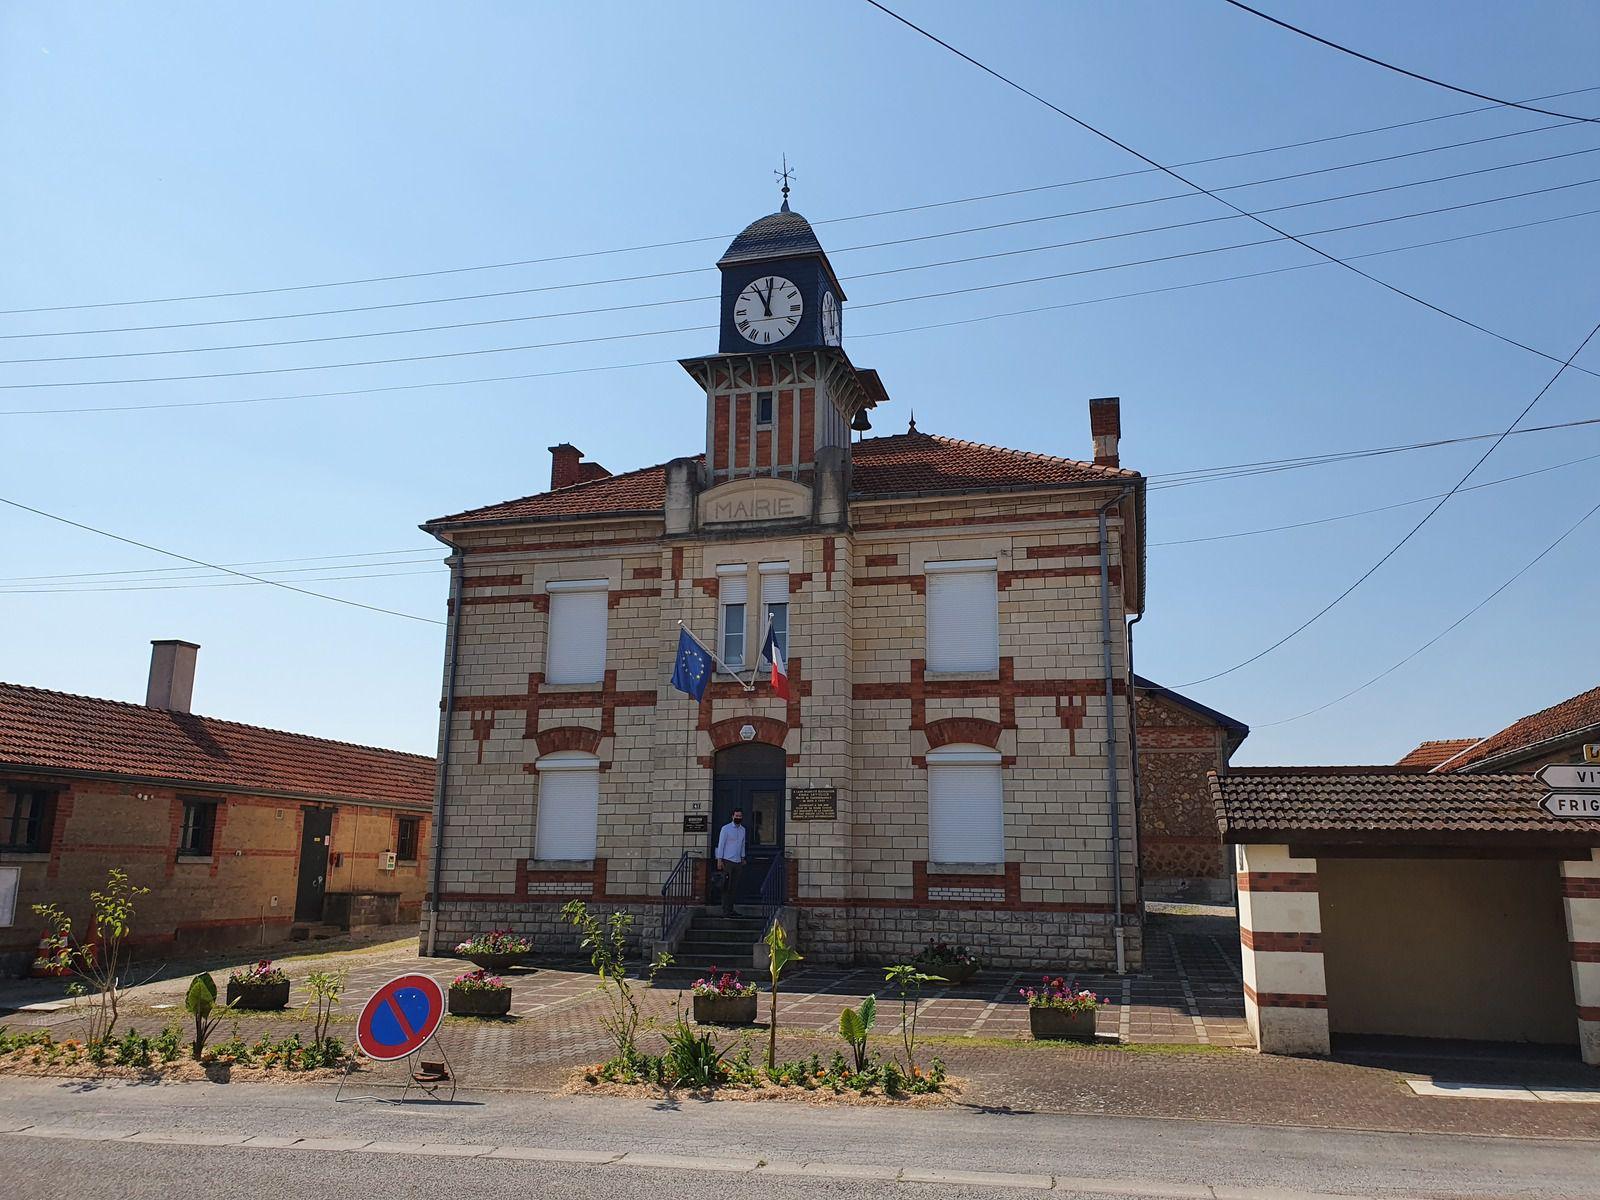 Mairie de Courdemanges